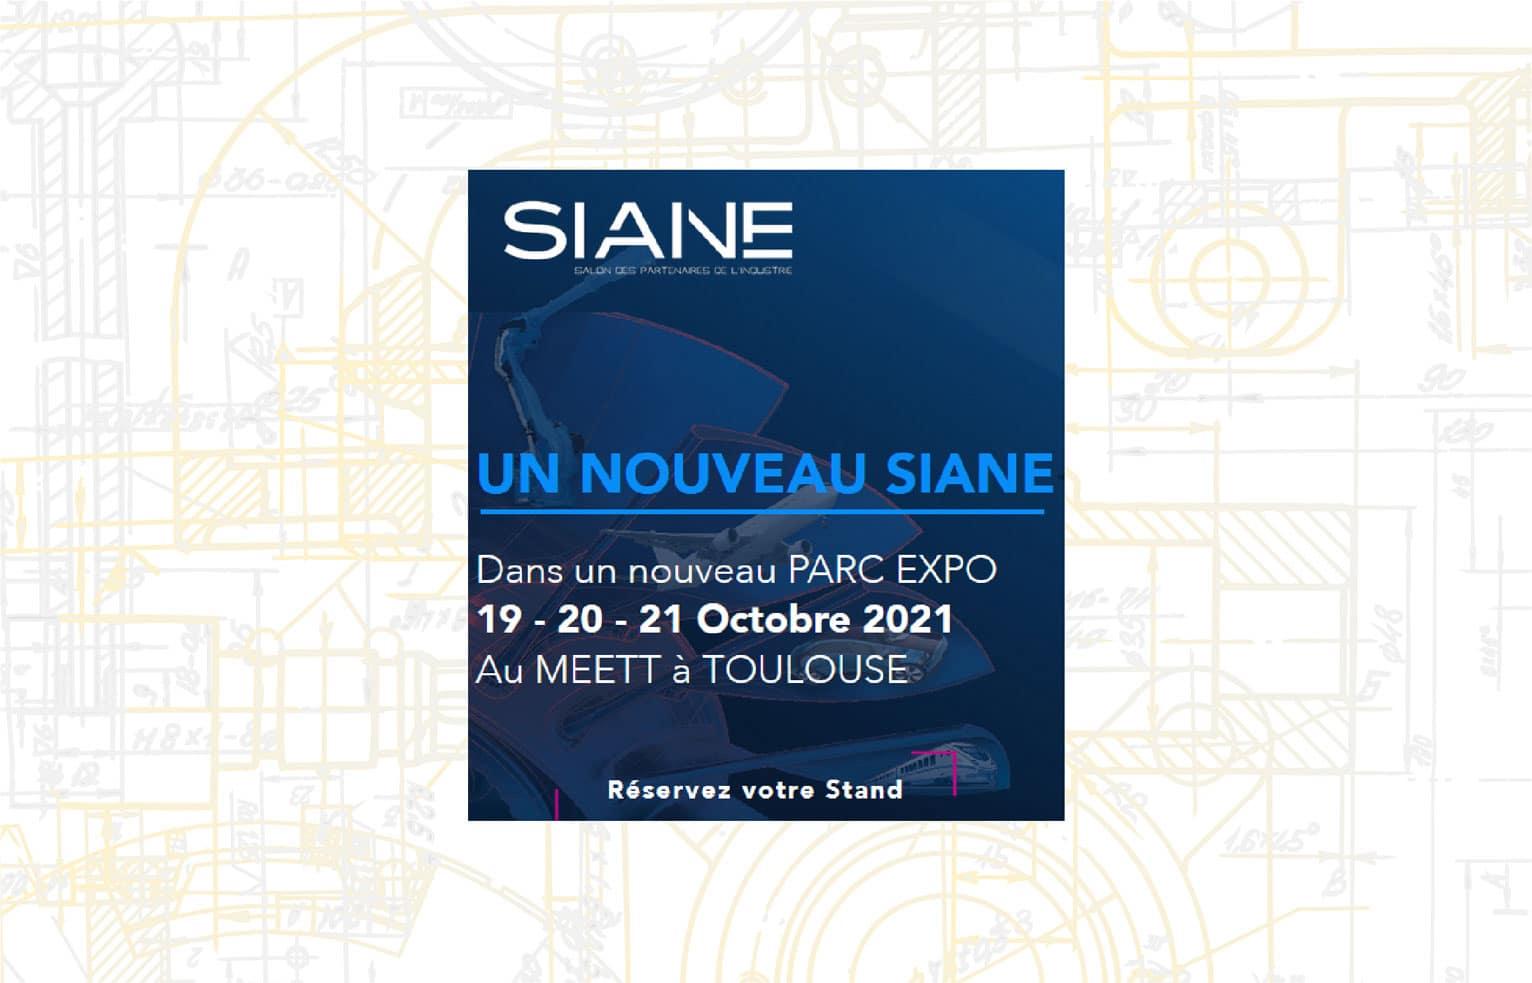 SIANE Toulouse Trade Fair